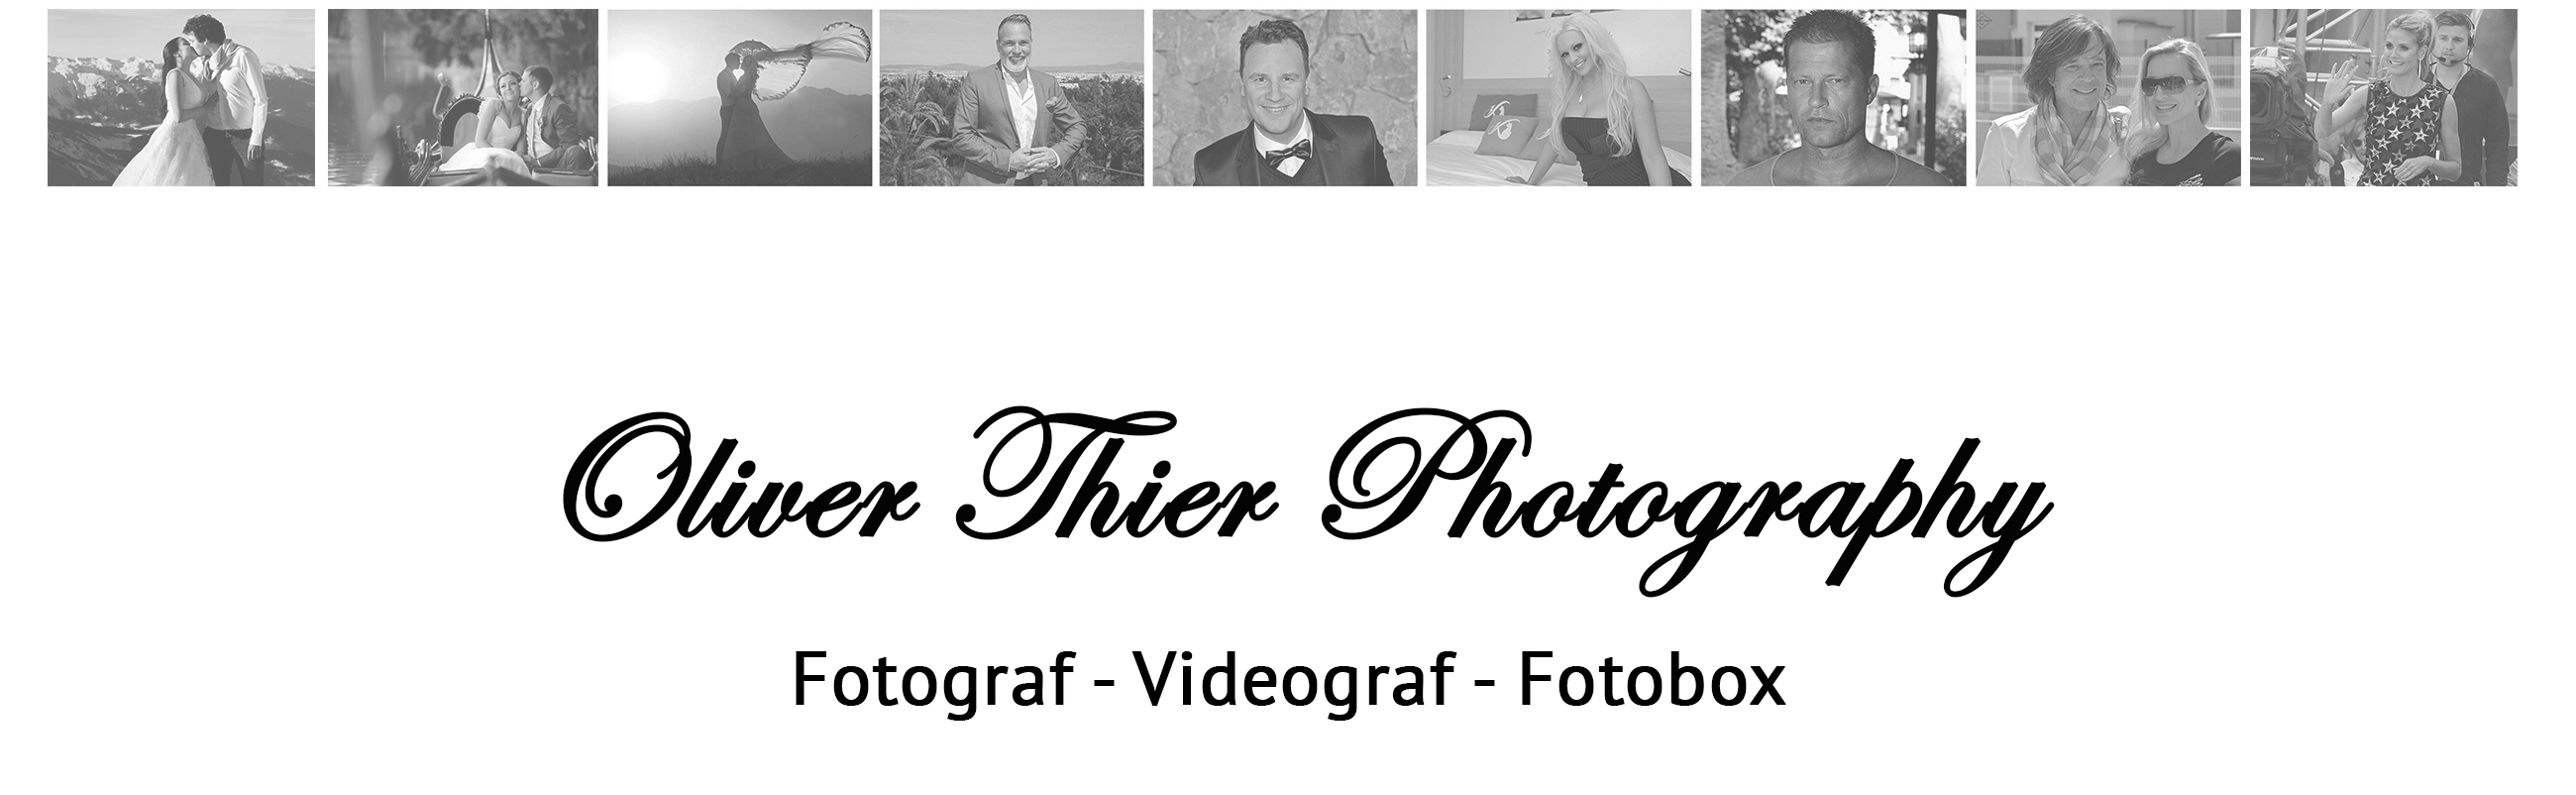 FOTOGRAF TEGERNSEE SCHLIERSEE ROTTACH EGERN SPITZINGSEE MIESBACH HOCHZEITSFOTOGRAF